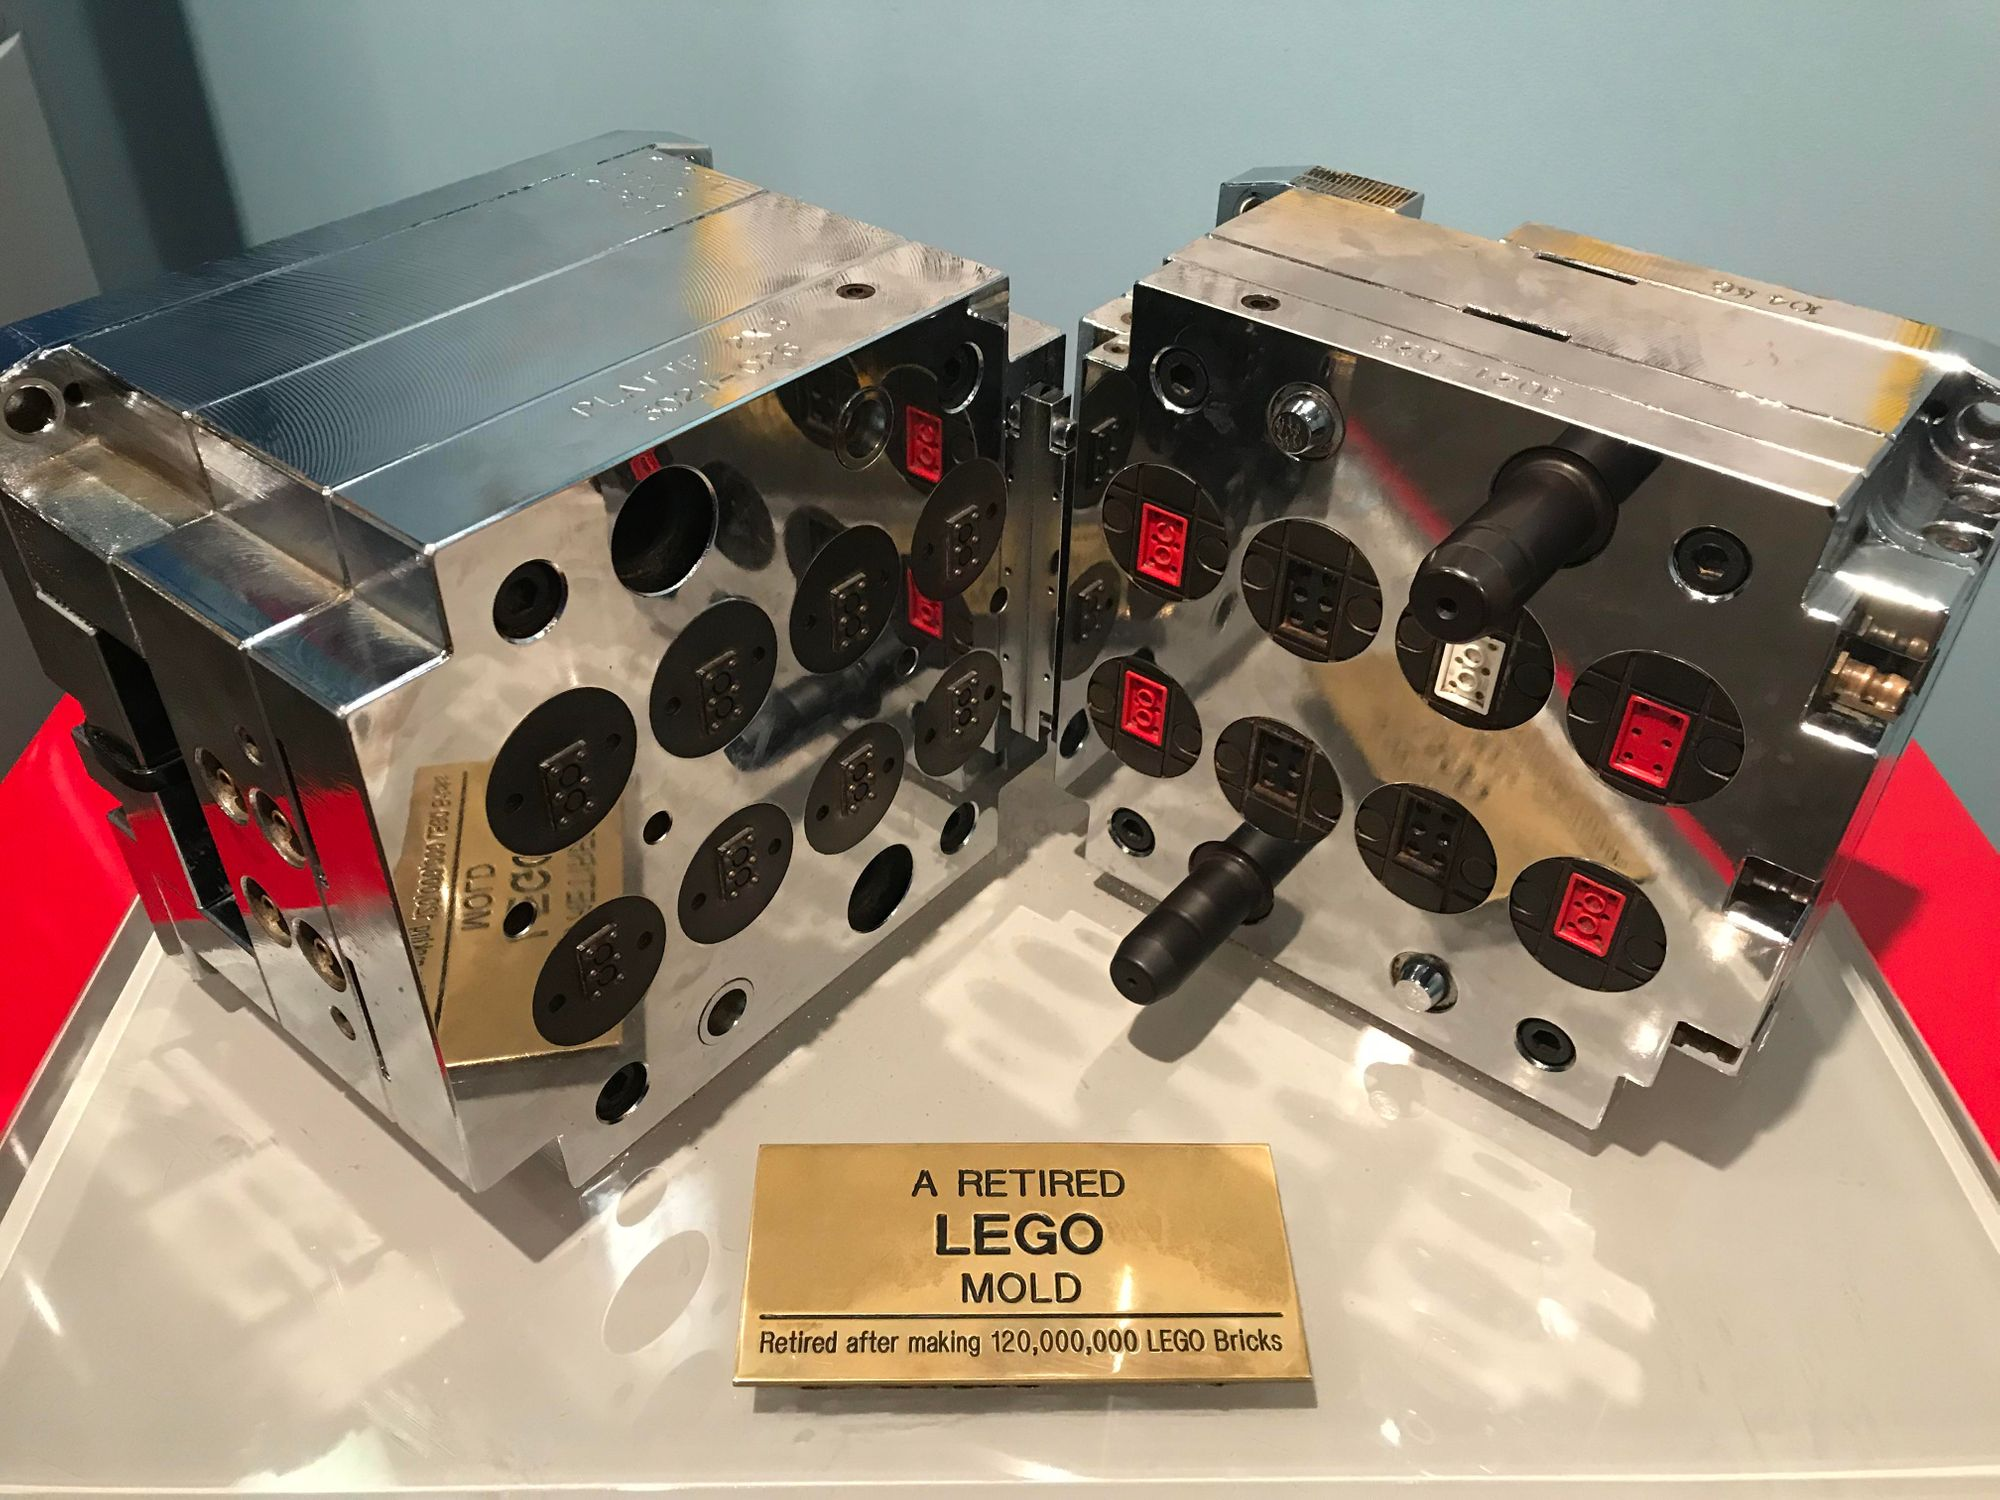 A retired LEGO mold used to produce 120 million LEGO bricks